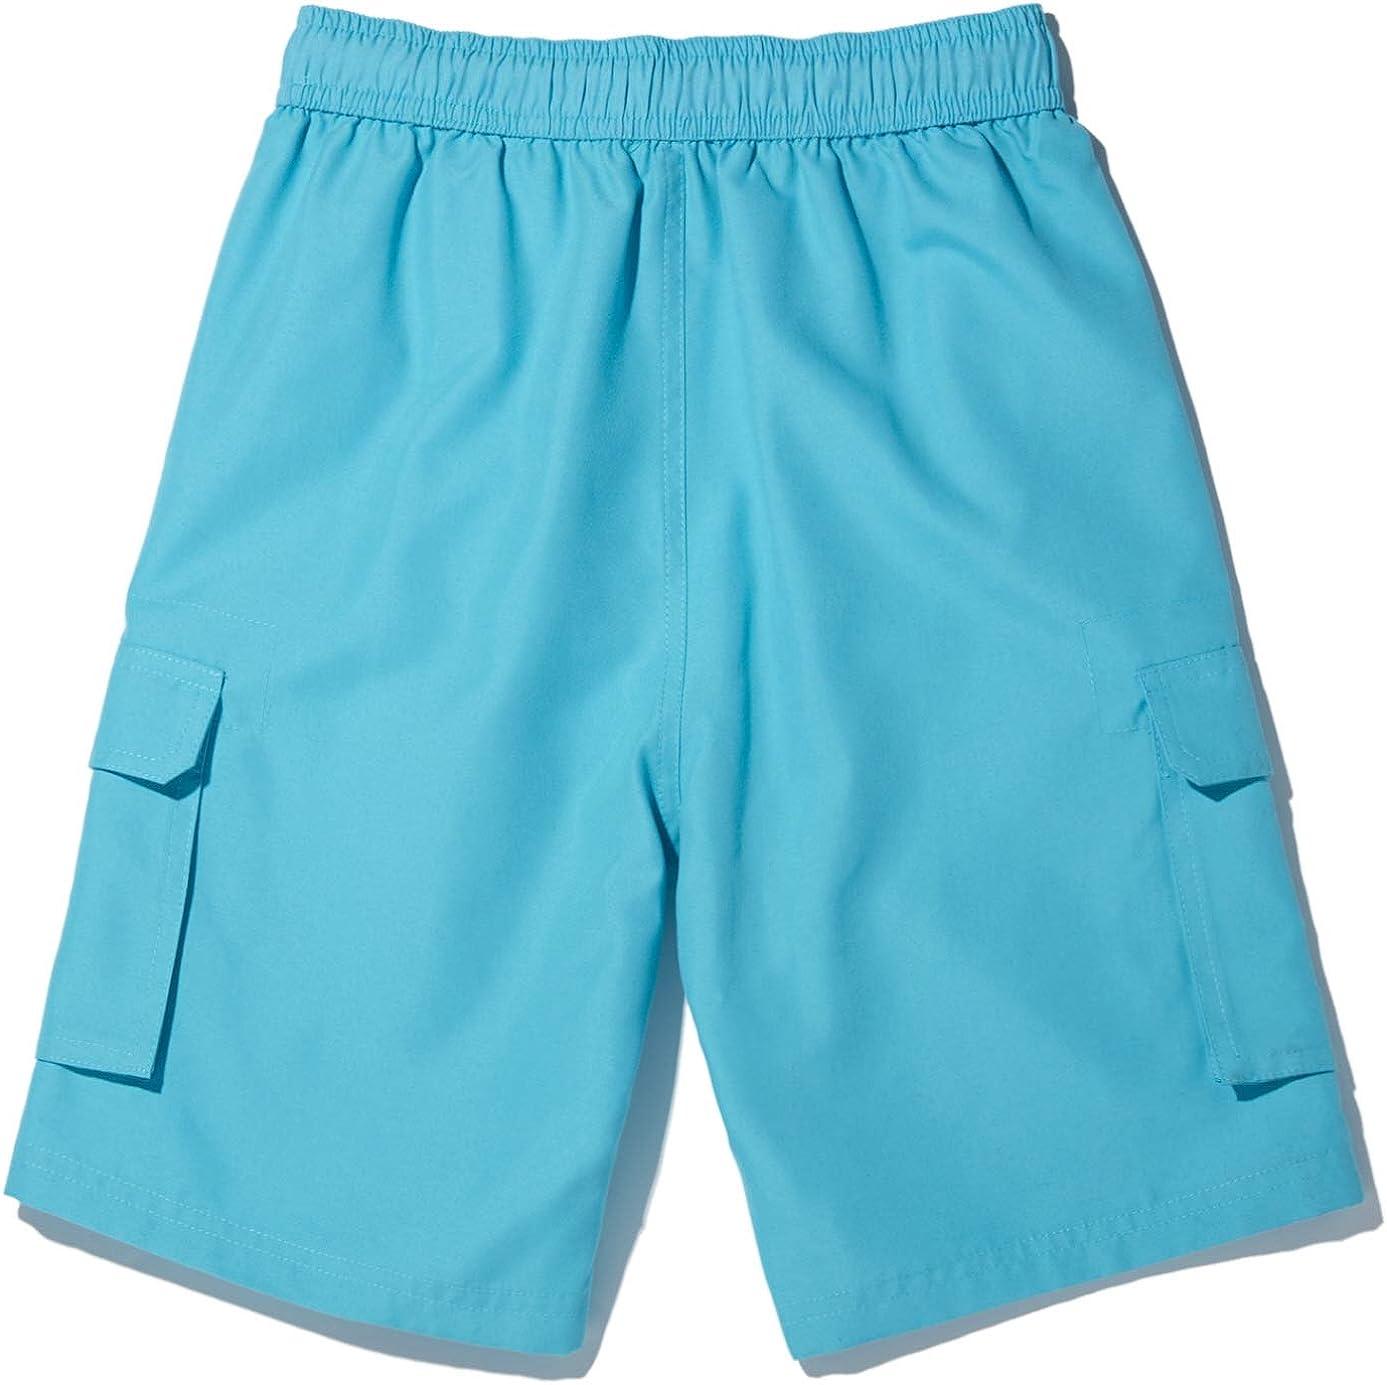 Quick Dry UPF 50 TSLA Boys Swim Trunks Beach Board Swim Shorts Swimsuit Swimwear with Inner Mesh Liner